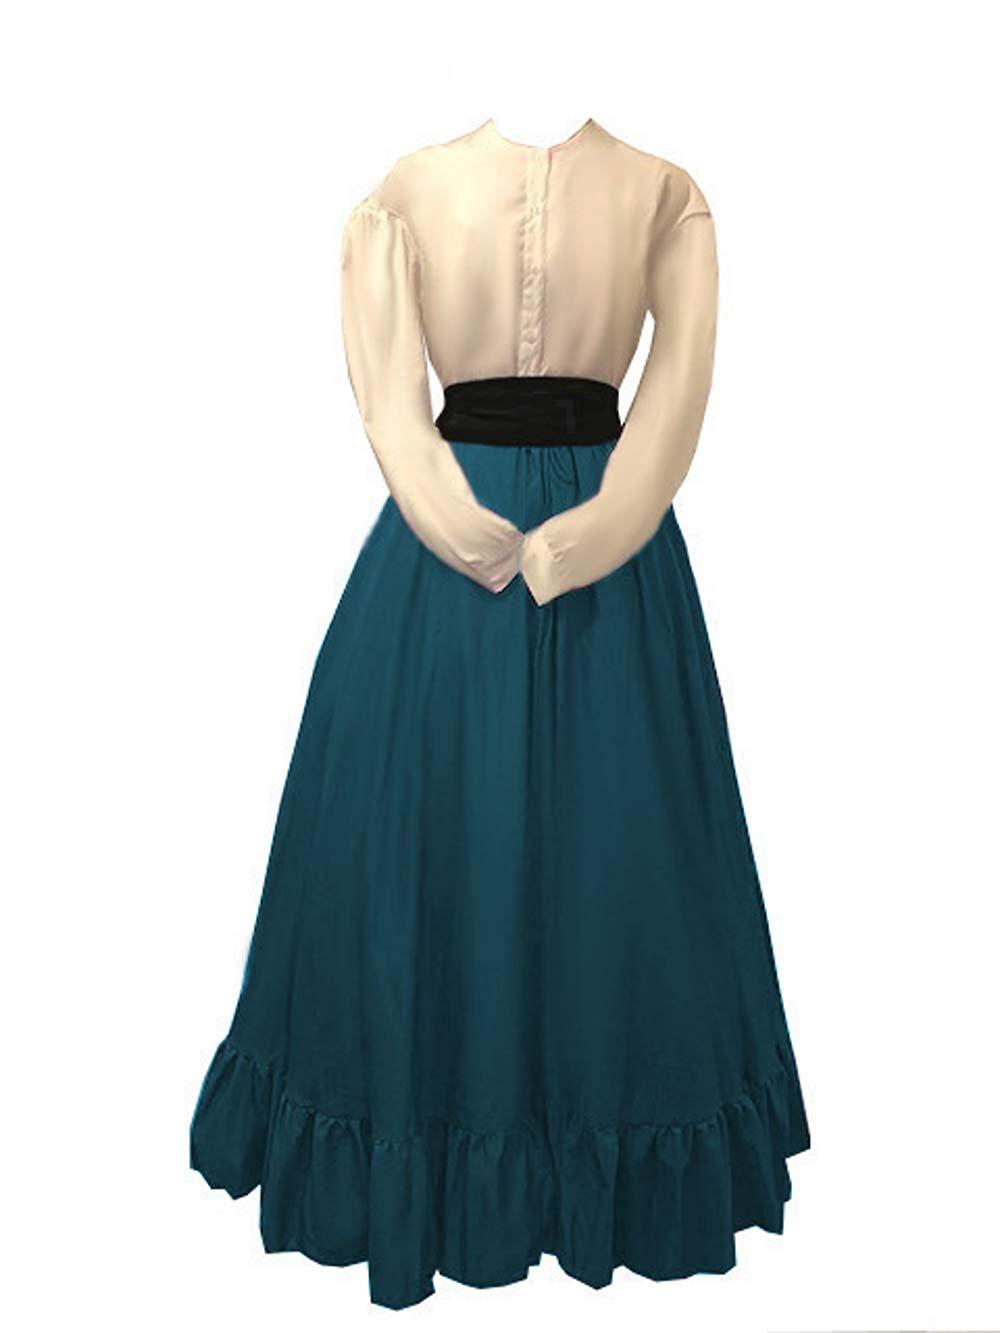 Victorian Dresses Victorian Ballgowns Victorian Clothing Victorian Costume Victorian Clothing Old Fashion Dresses [ 1333 x 1000 Pixel ]